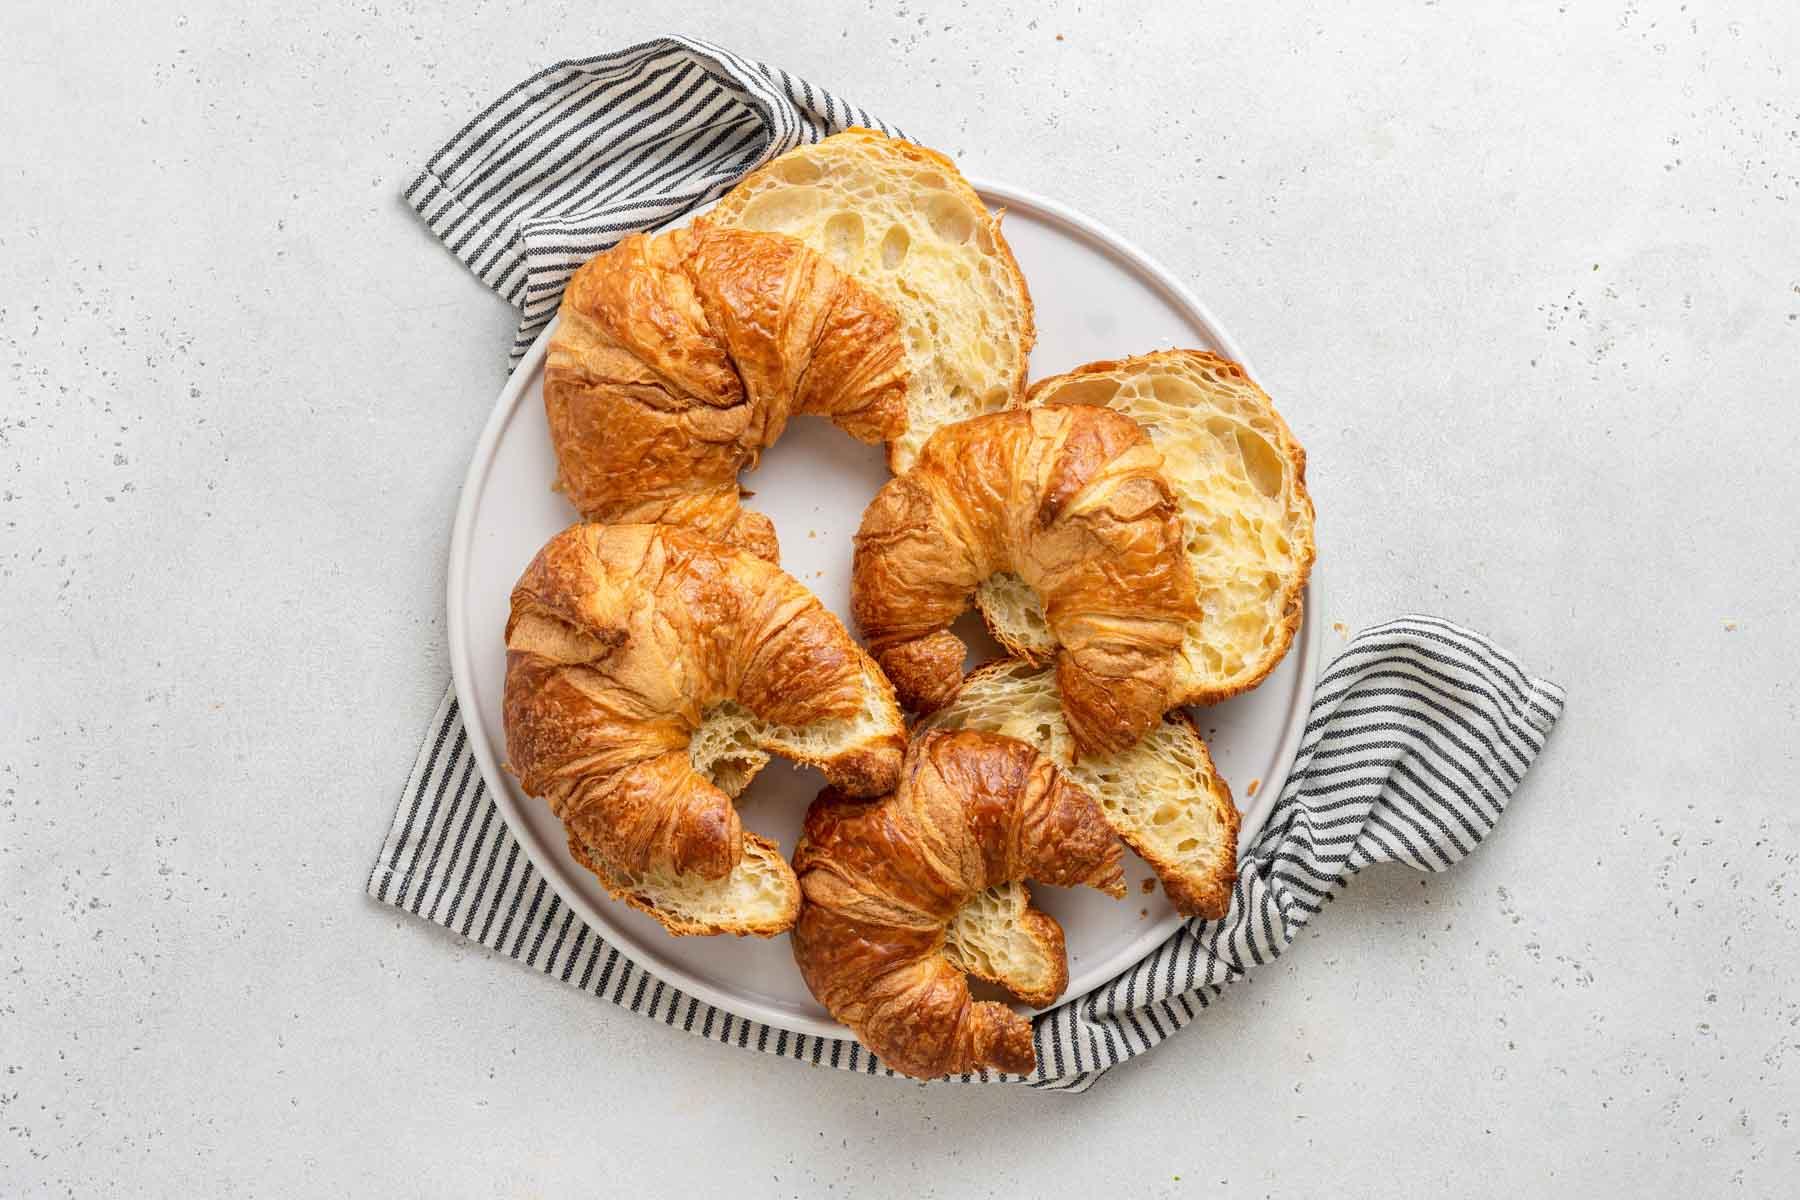 Croissants slice in half on plate.